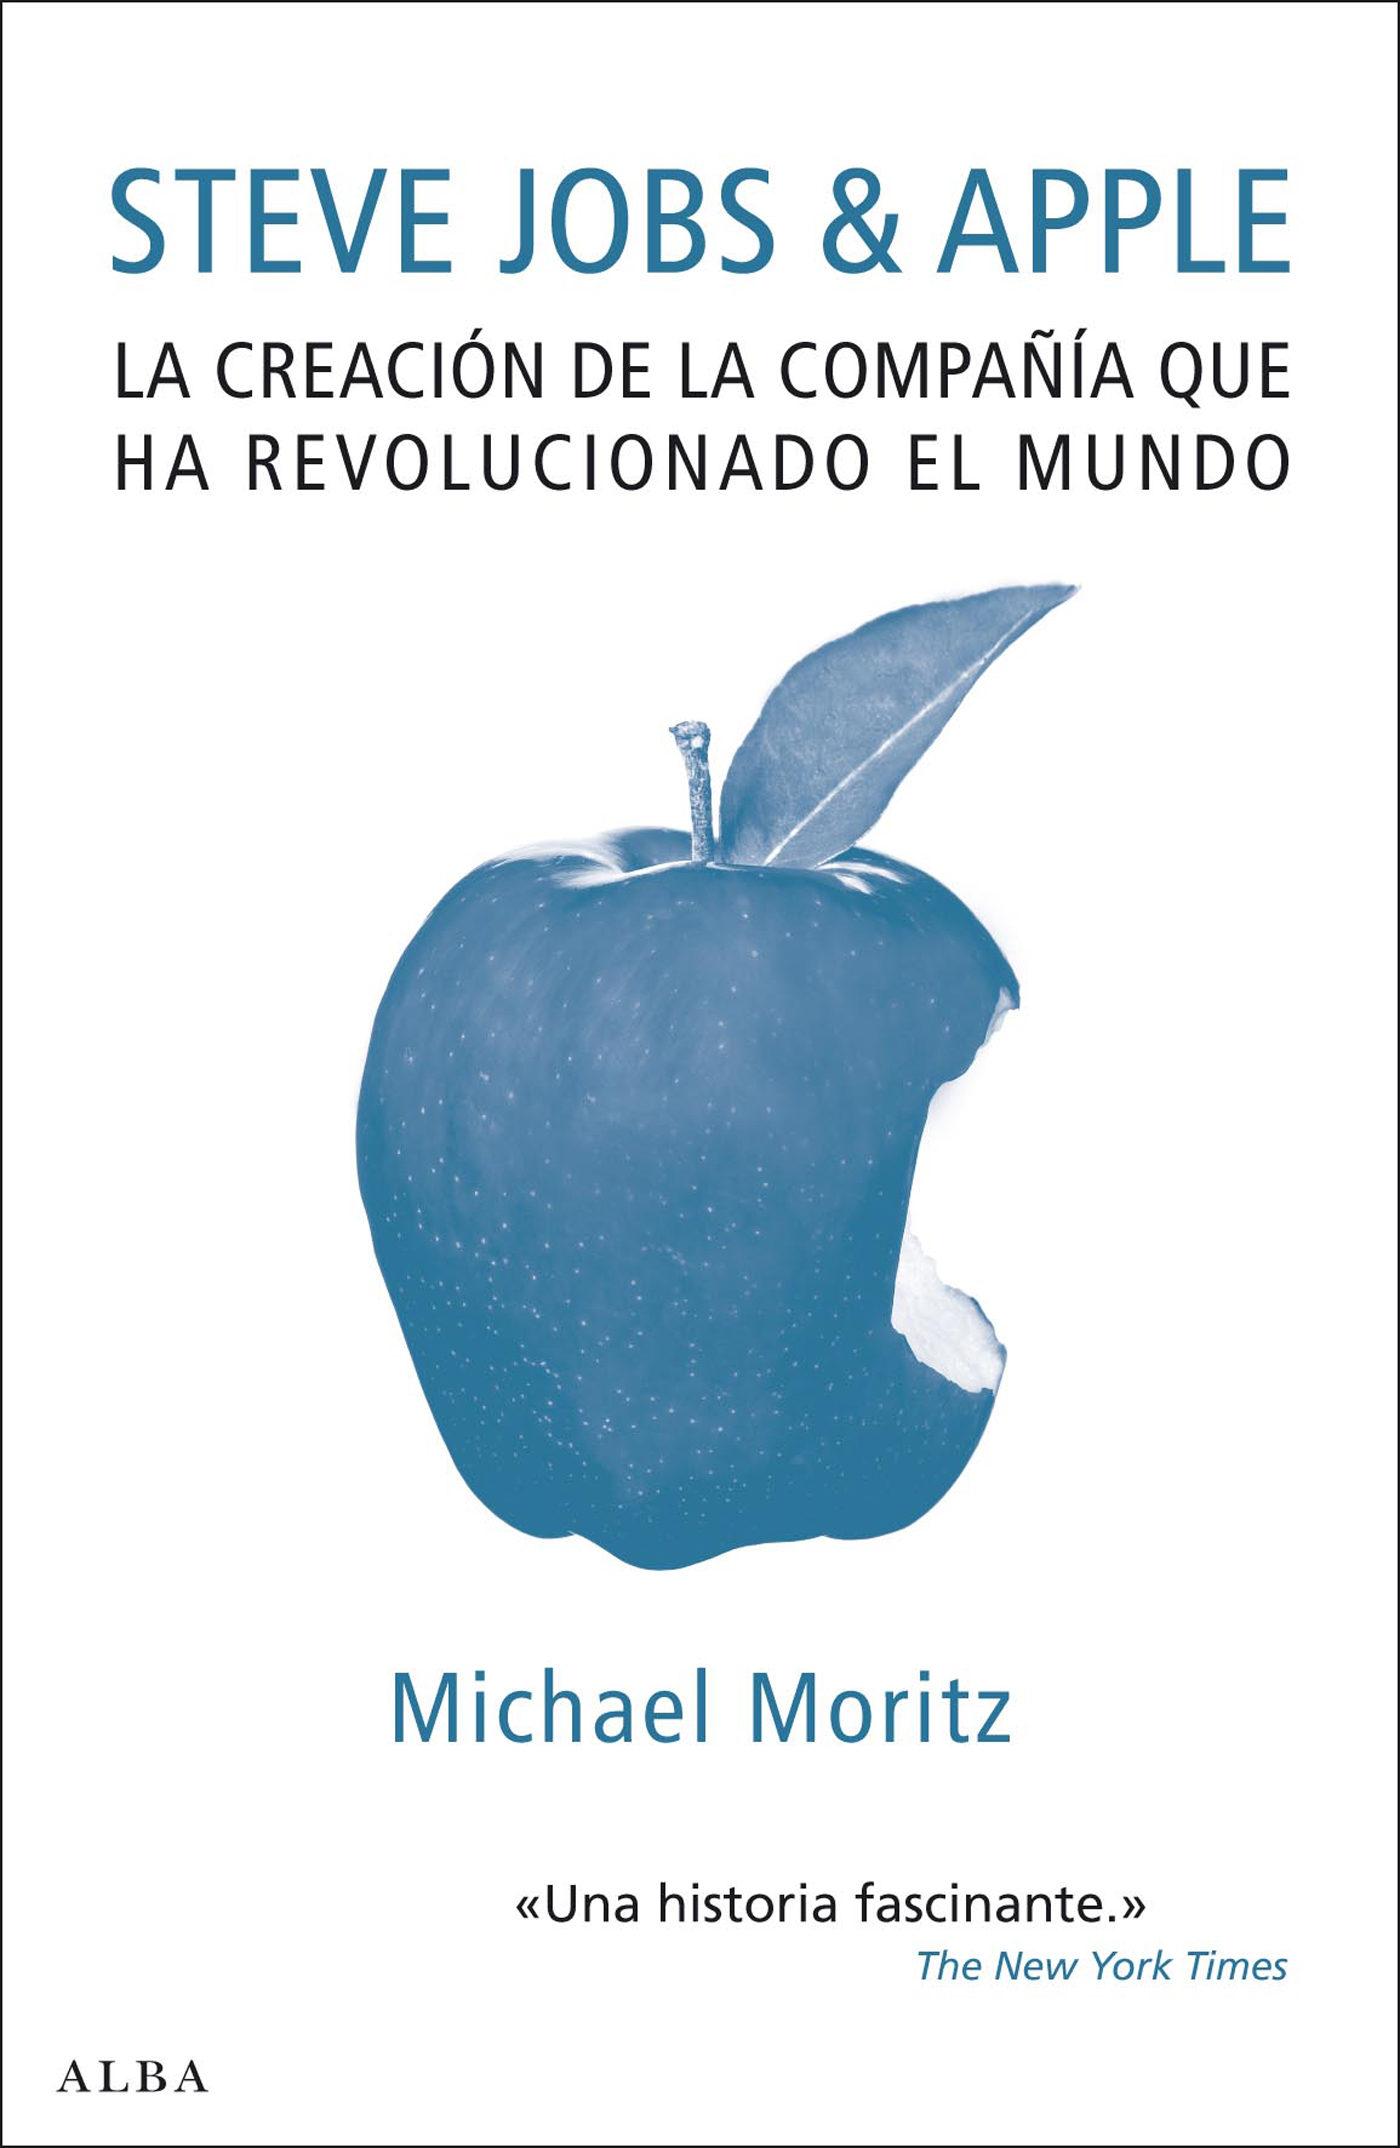 steve jobs apple ebook michael morits descargar libro pdf o epub